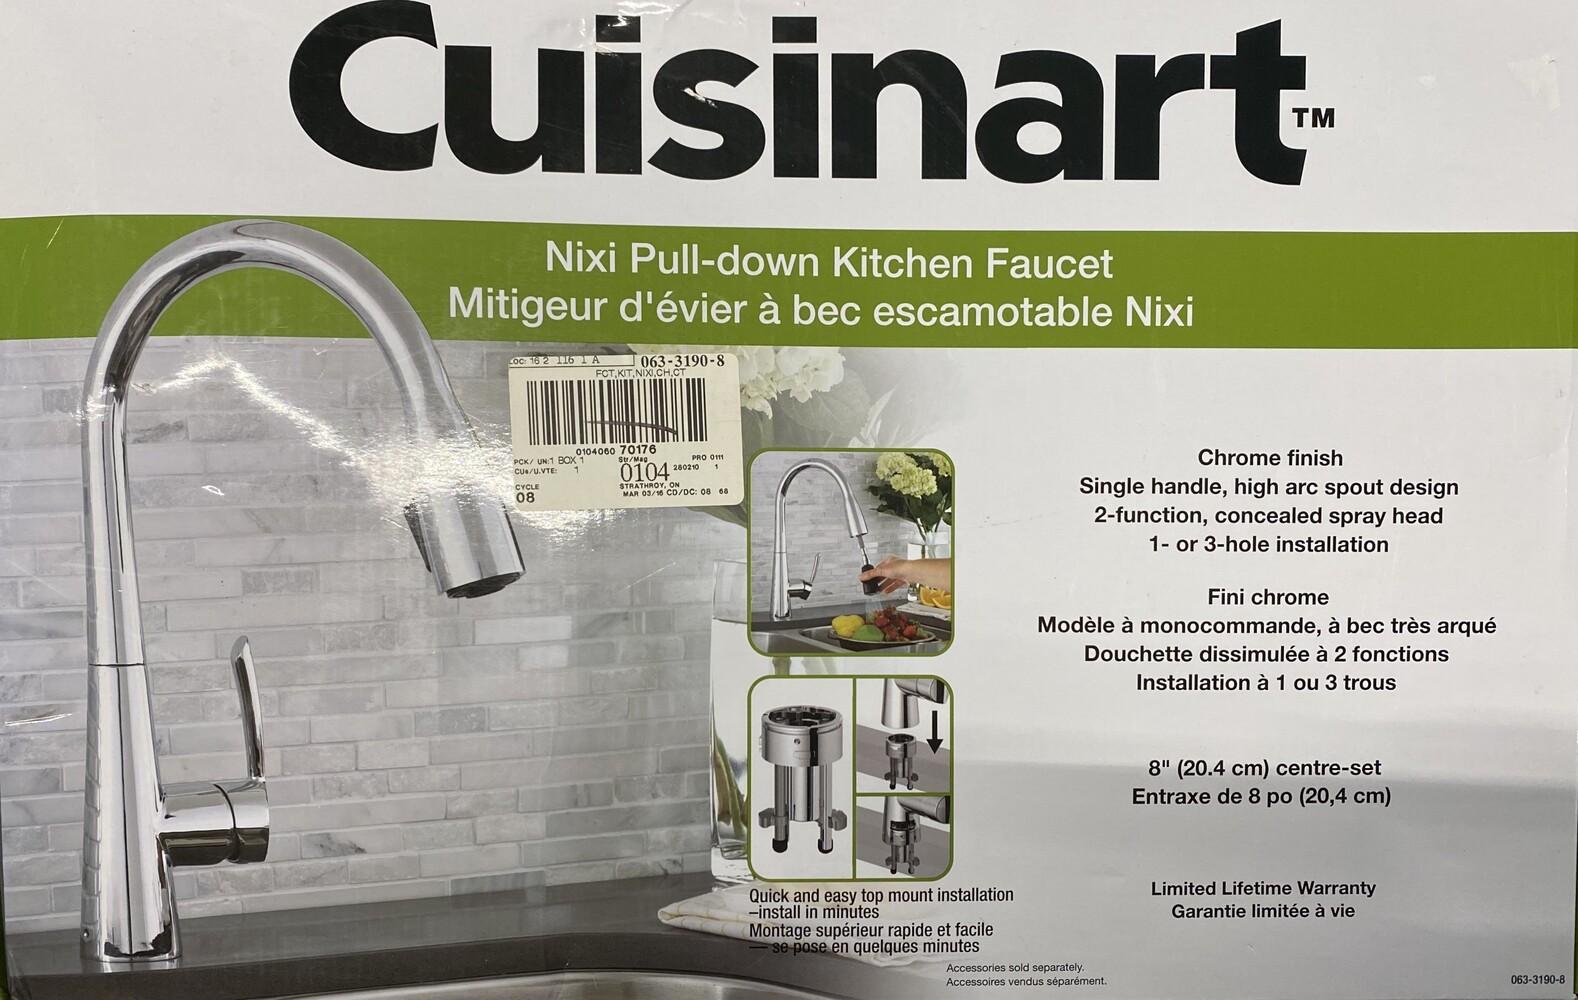 Cuisinart Nixi Pull Down Kitchen Faucet Avenue Shop Swap Sell